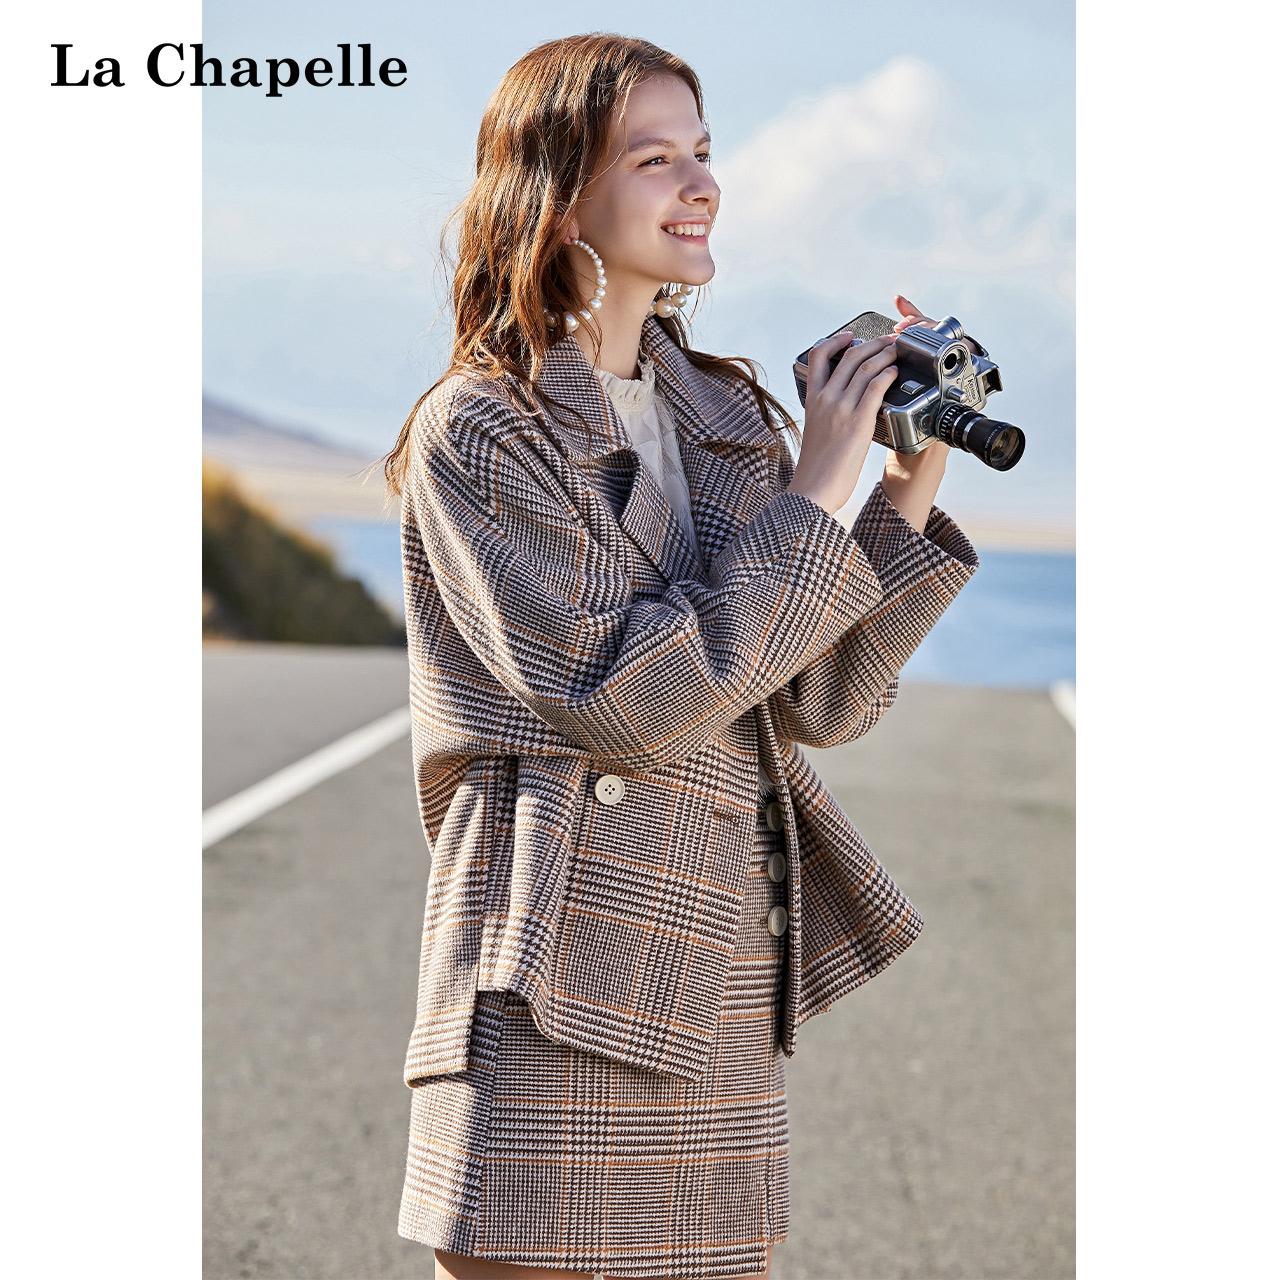 La Chapelle 拉夏贝尔 女士格纹西装裙+西装外套套装